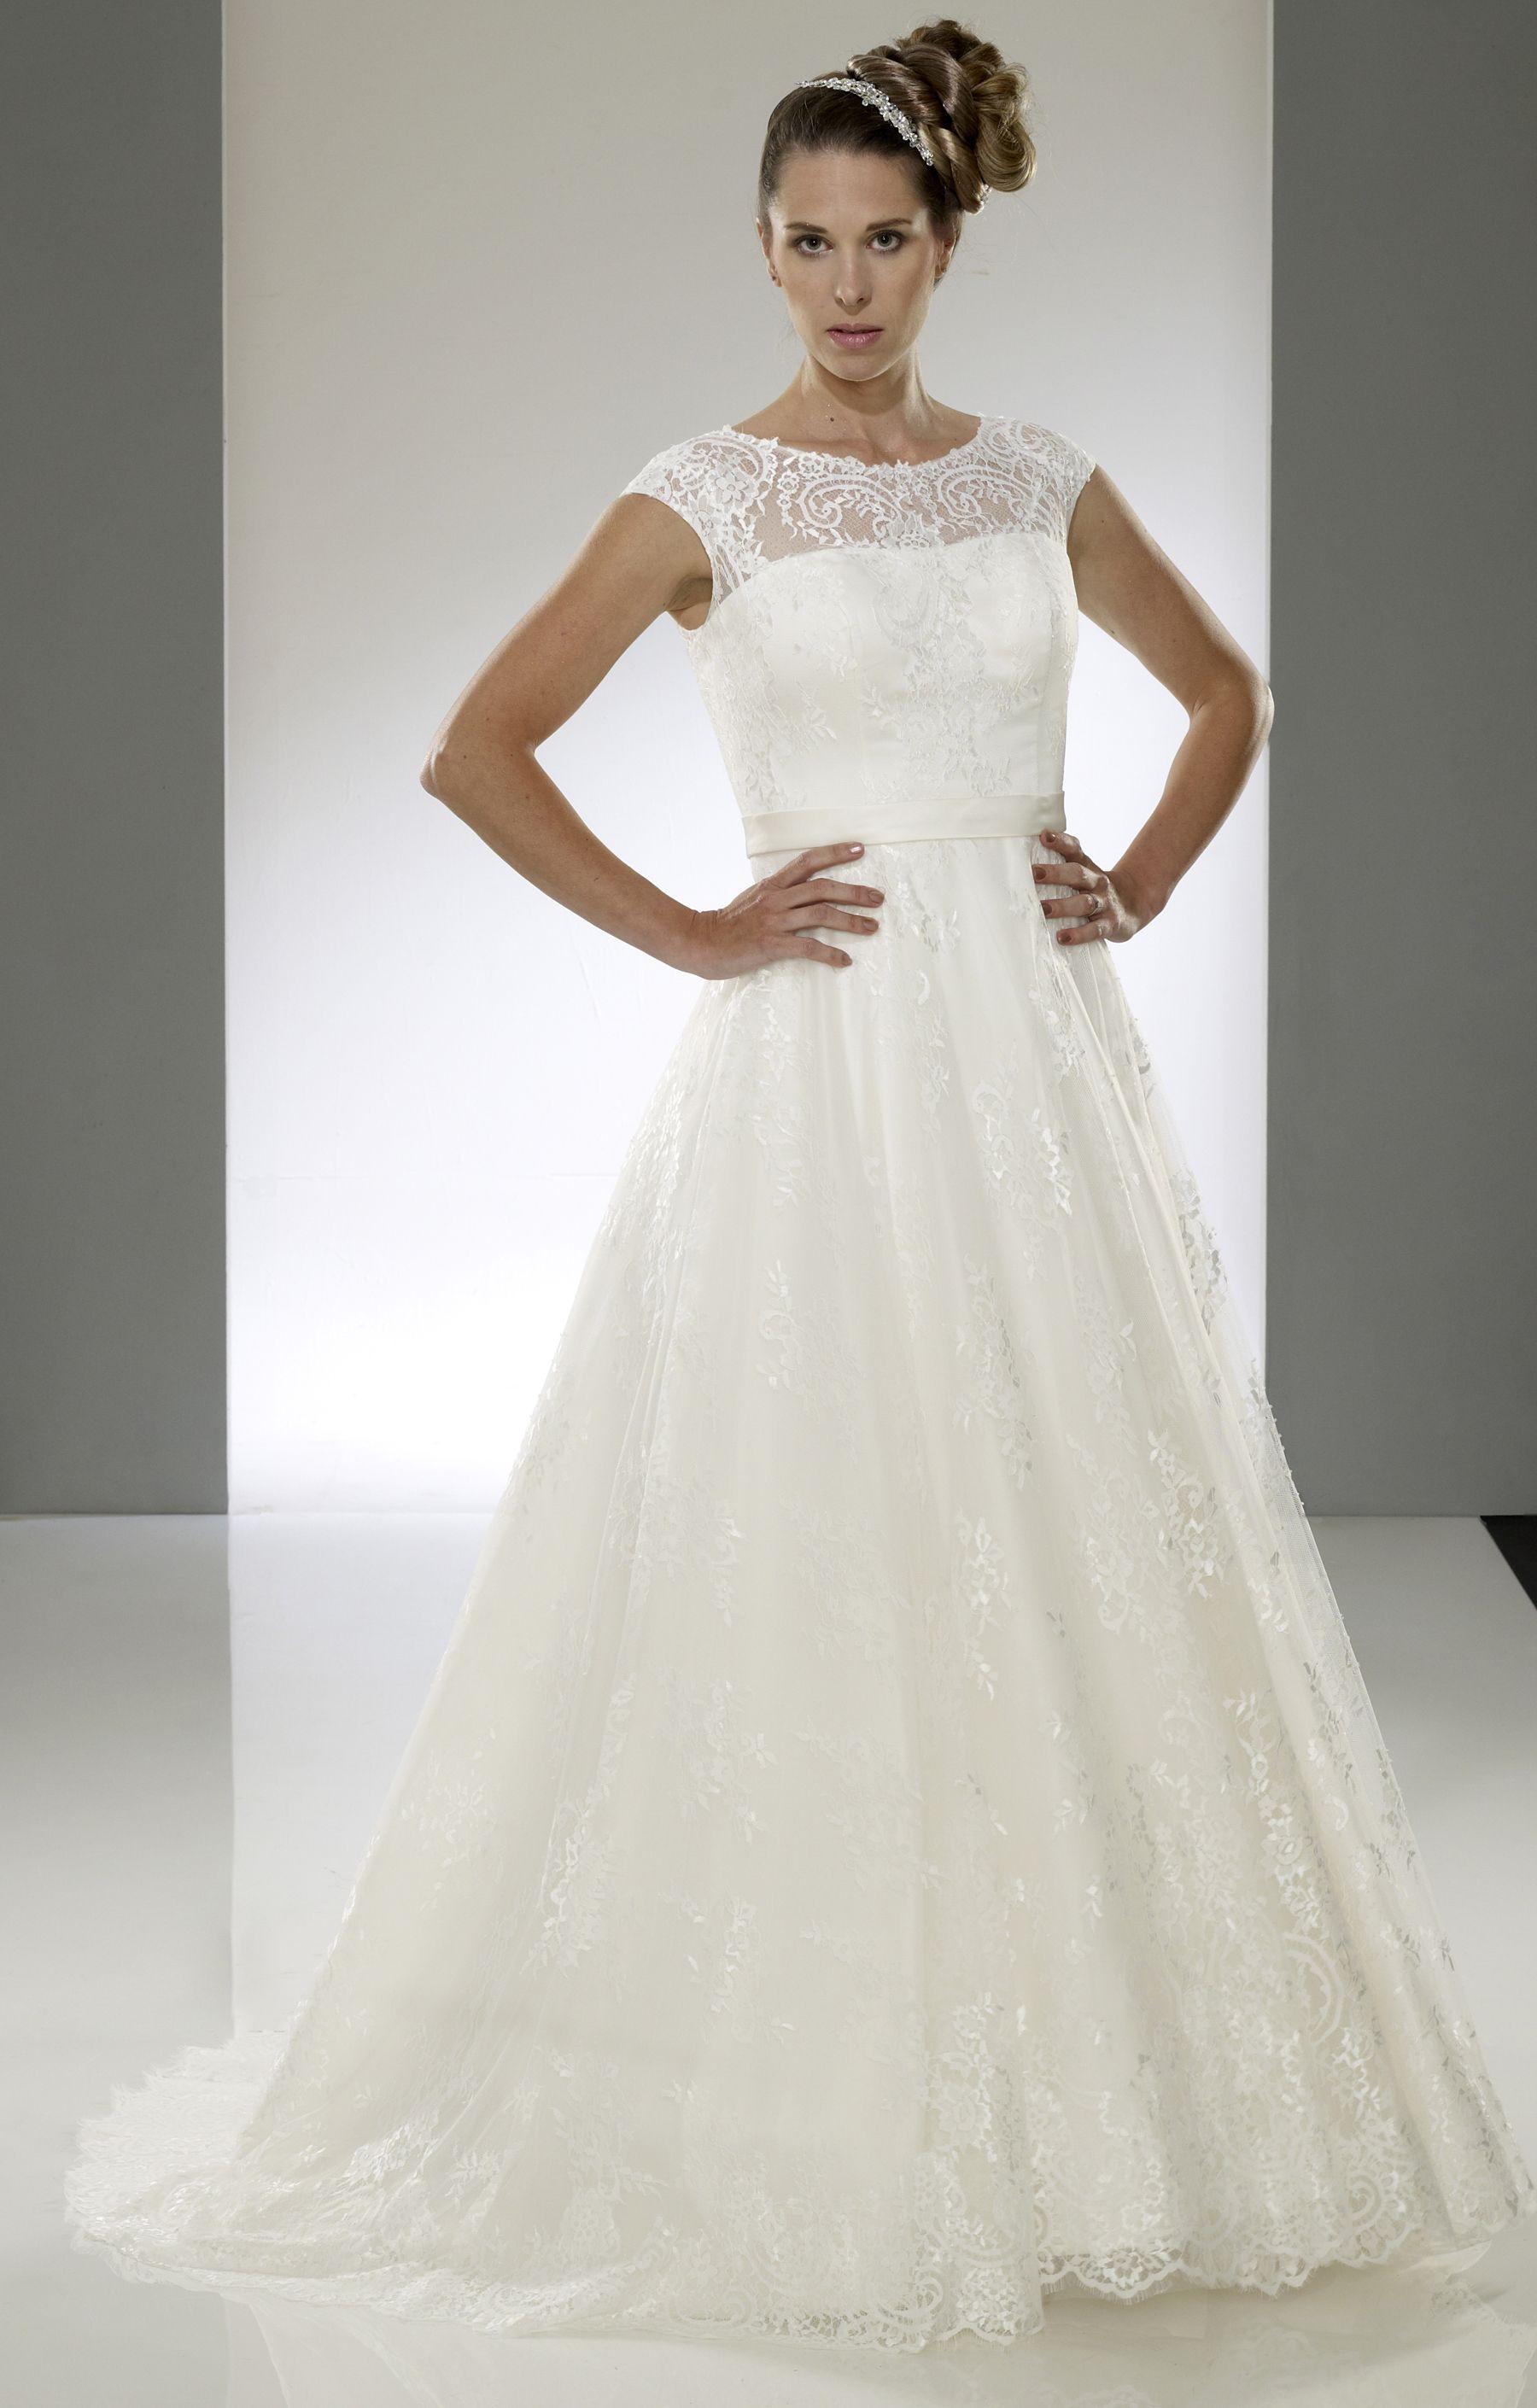 Kendall | Brides By Harvee | Pinterest